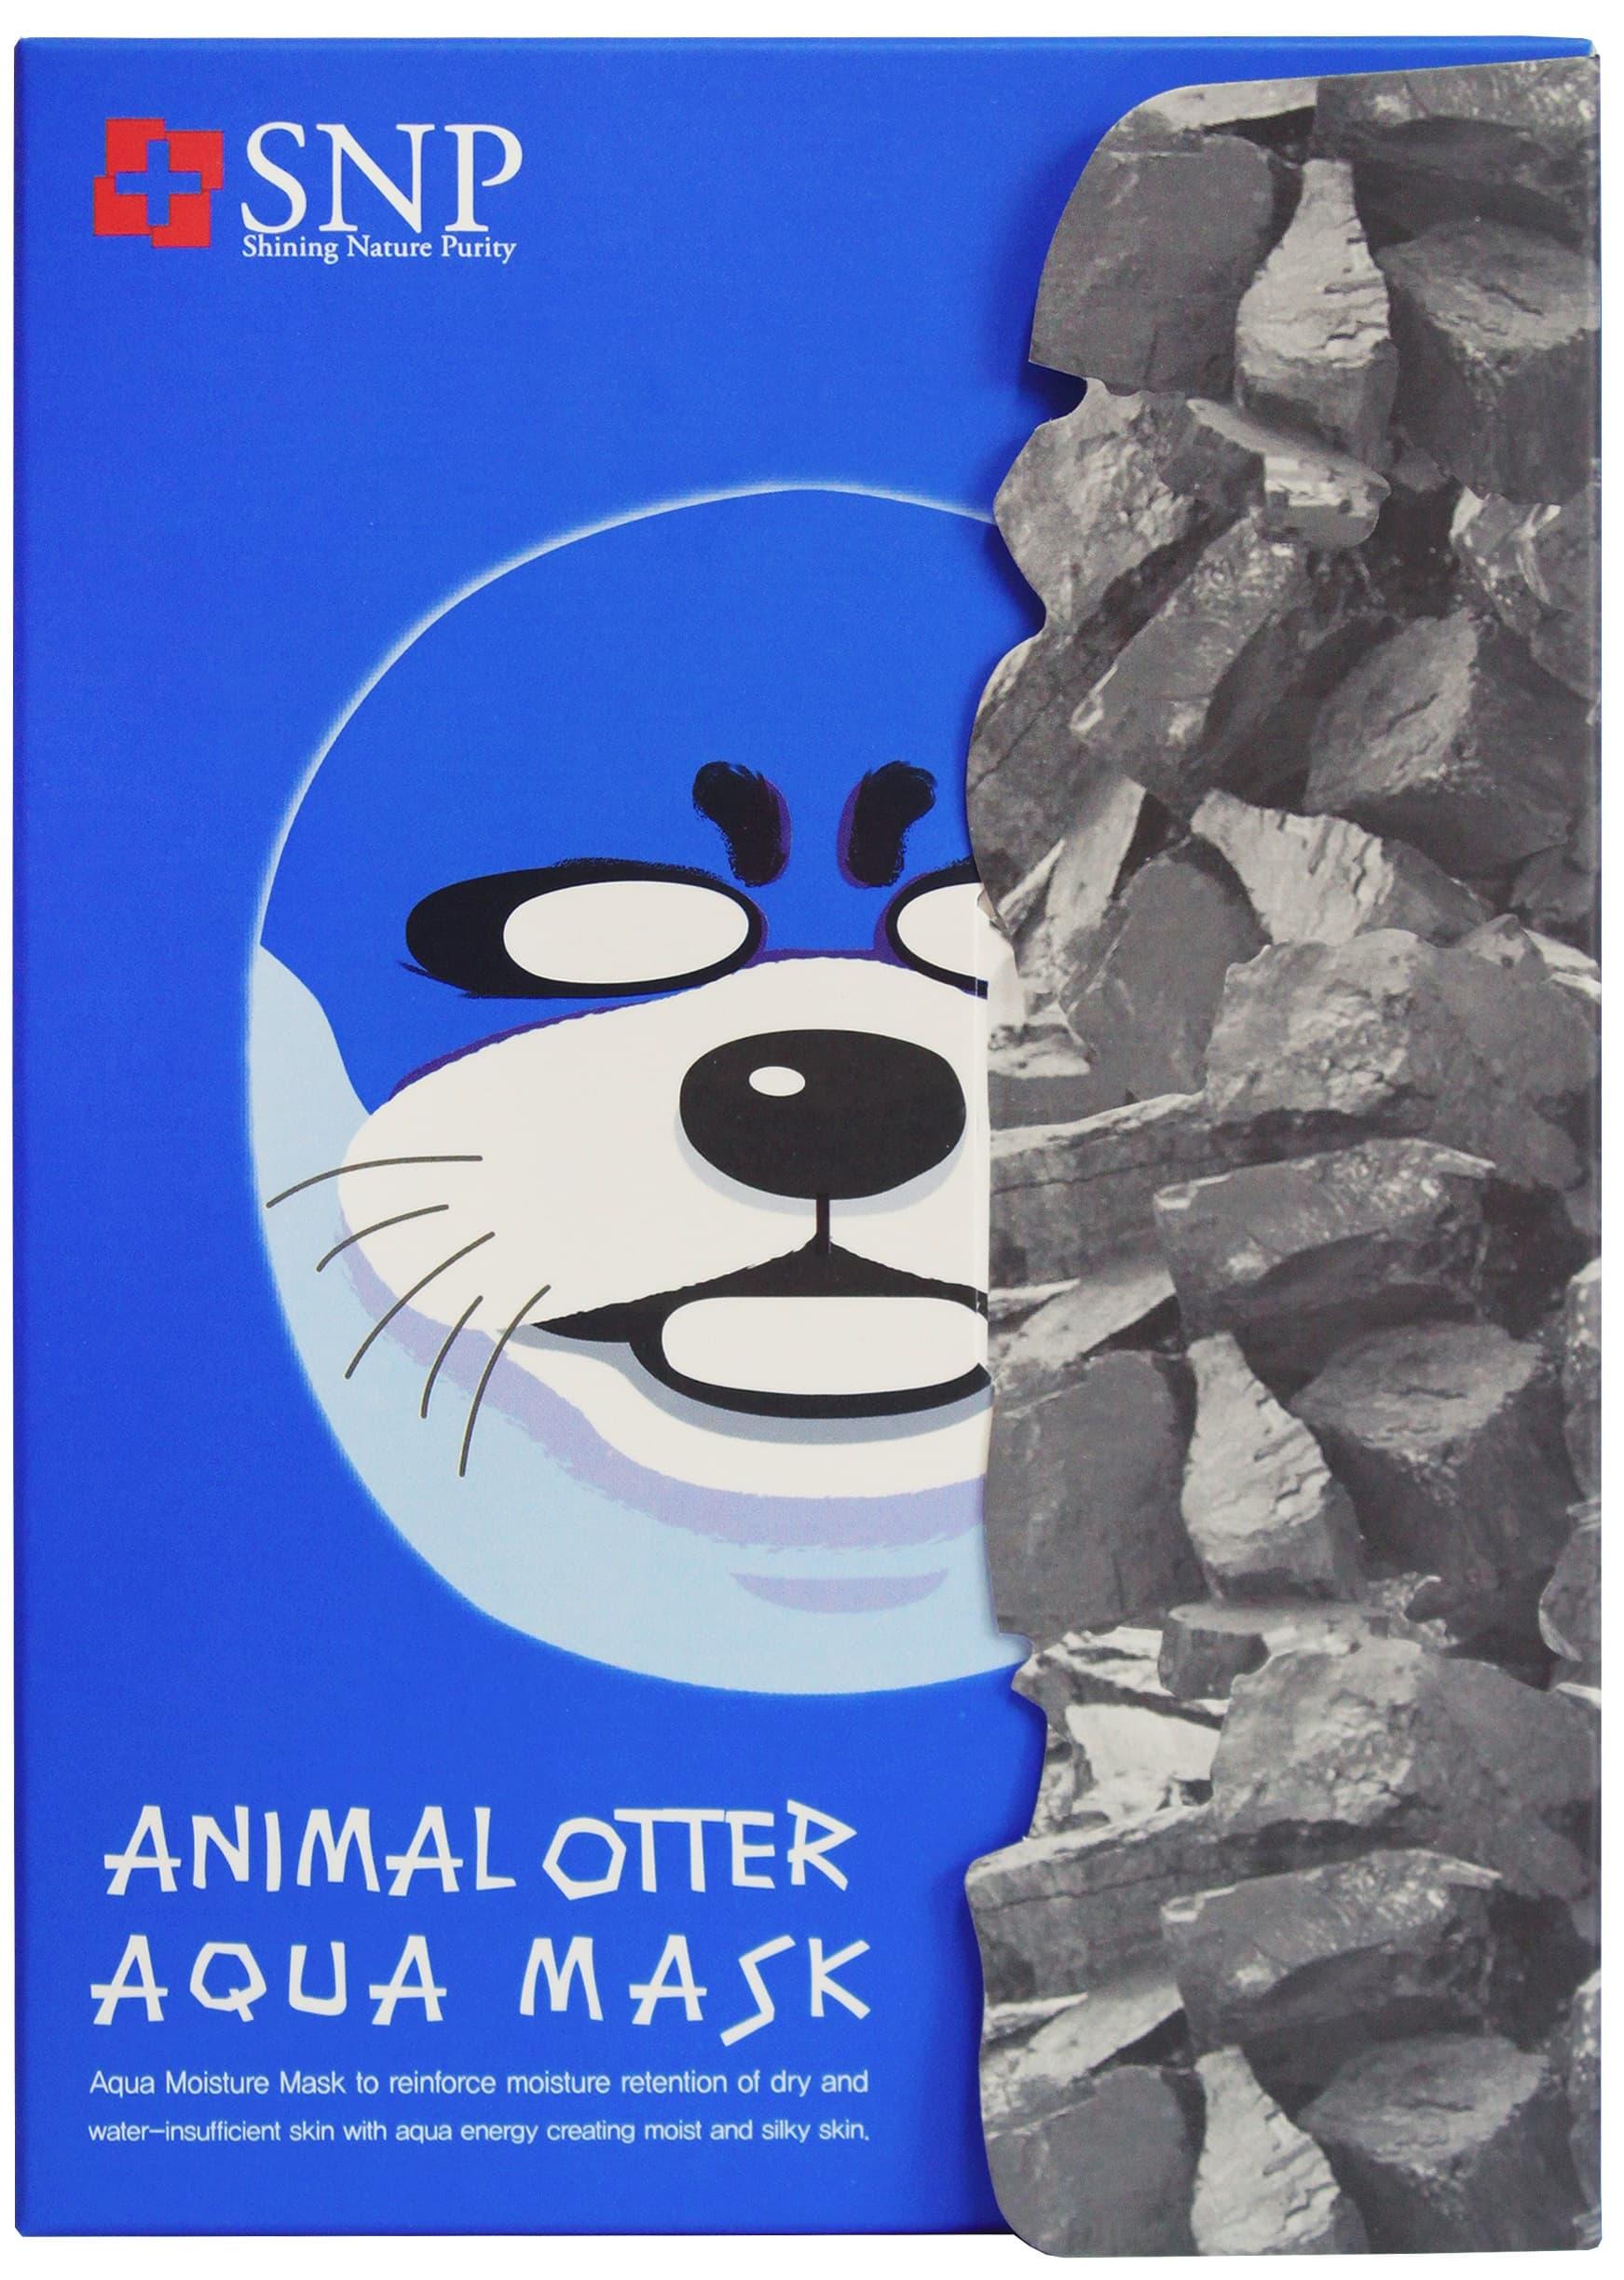 Health Beautyskin Careface Body Mask Tradekorea Snp Animal Masker Face 113 Otter